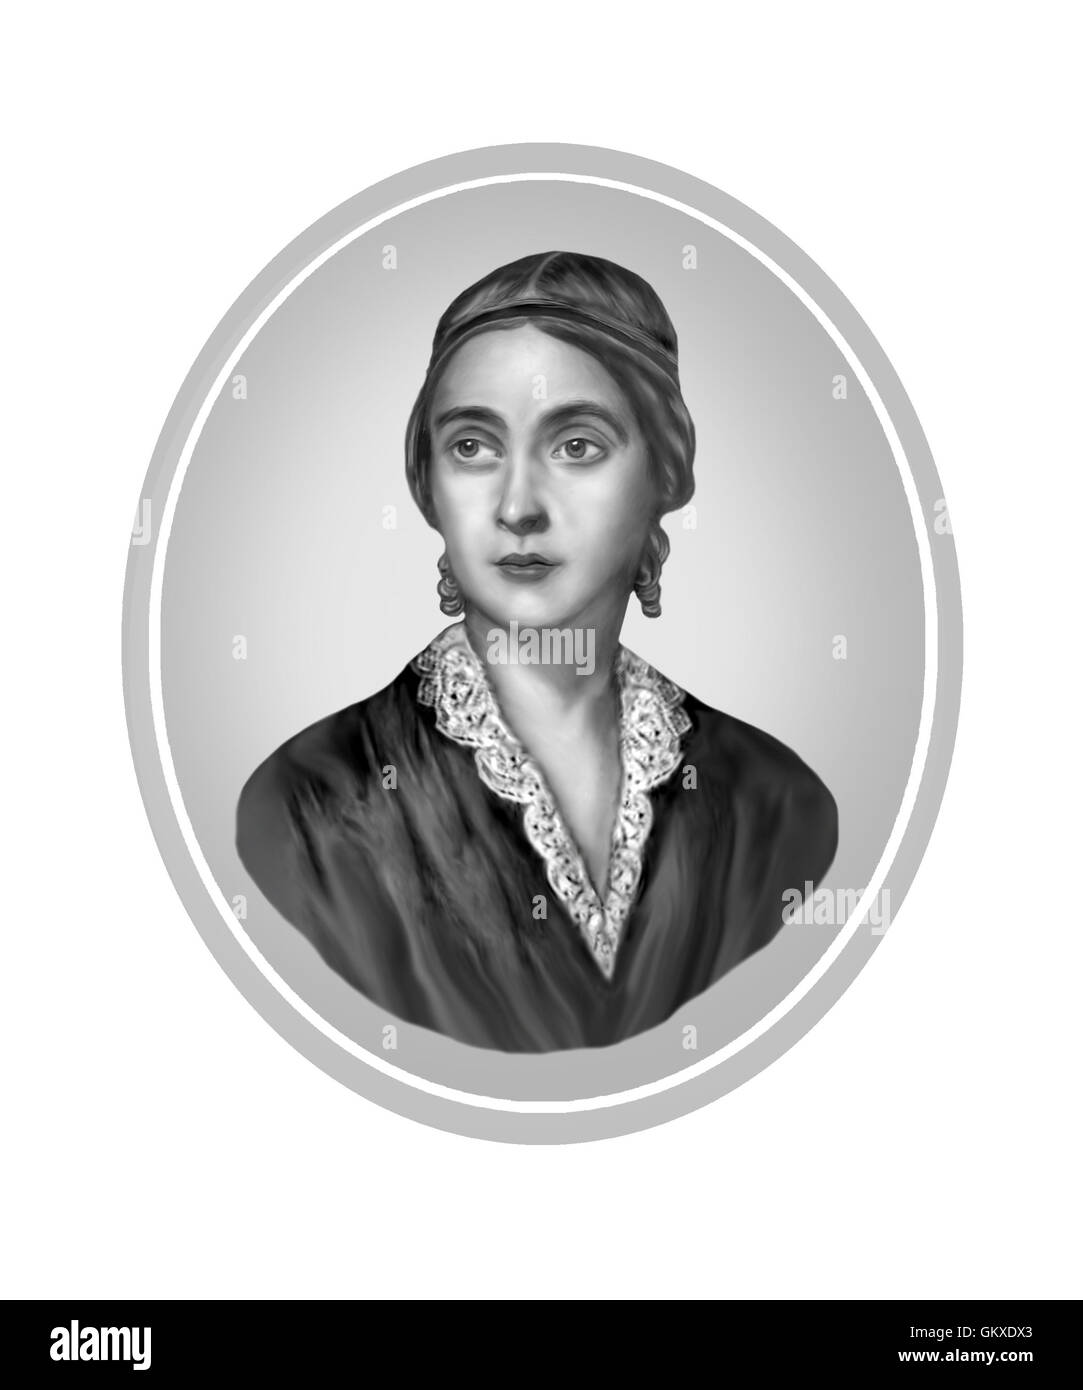 Caroline Norton, 18-8-1877, Writer, Reformer - Stock Image